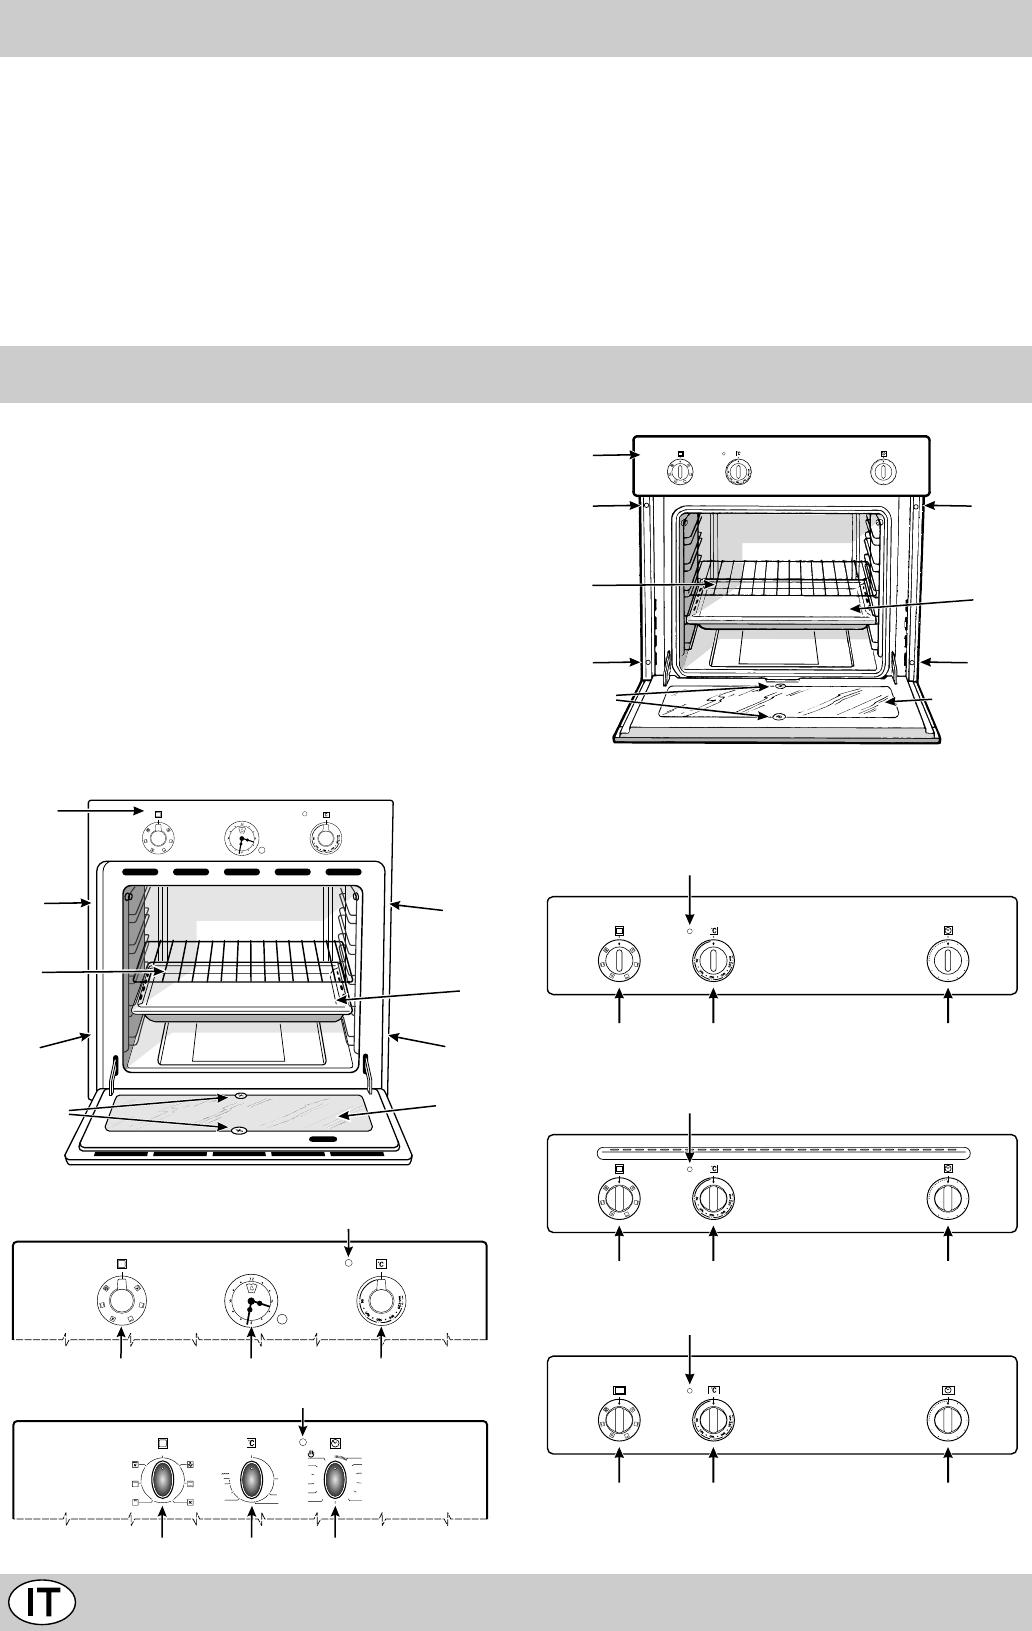 Handleiding Ariston Fm 24 T Pagina 2 Van 26 English